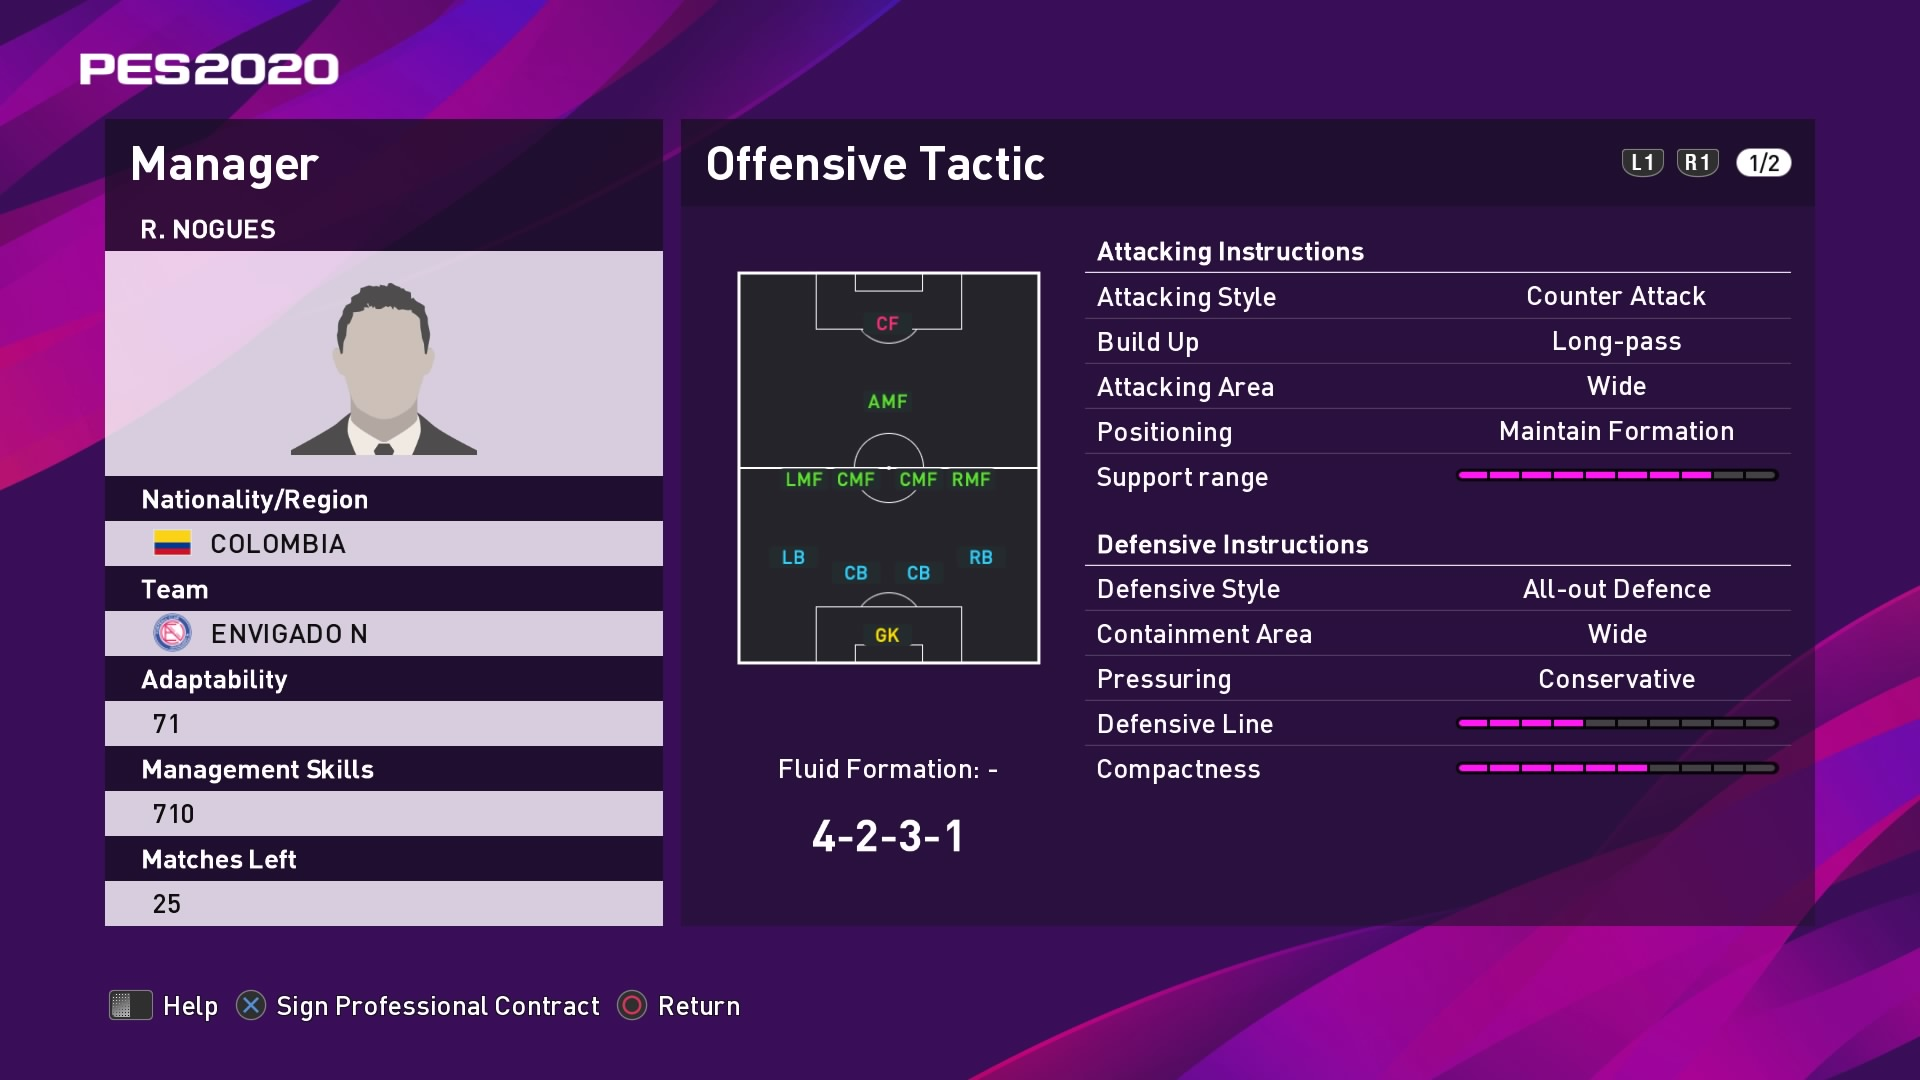 R. Nogues (José Arastey) Offensive Tactic in PES 2020 myClub